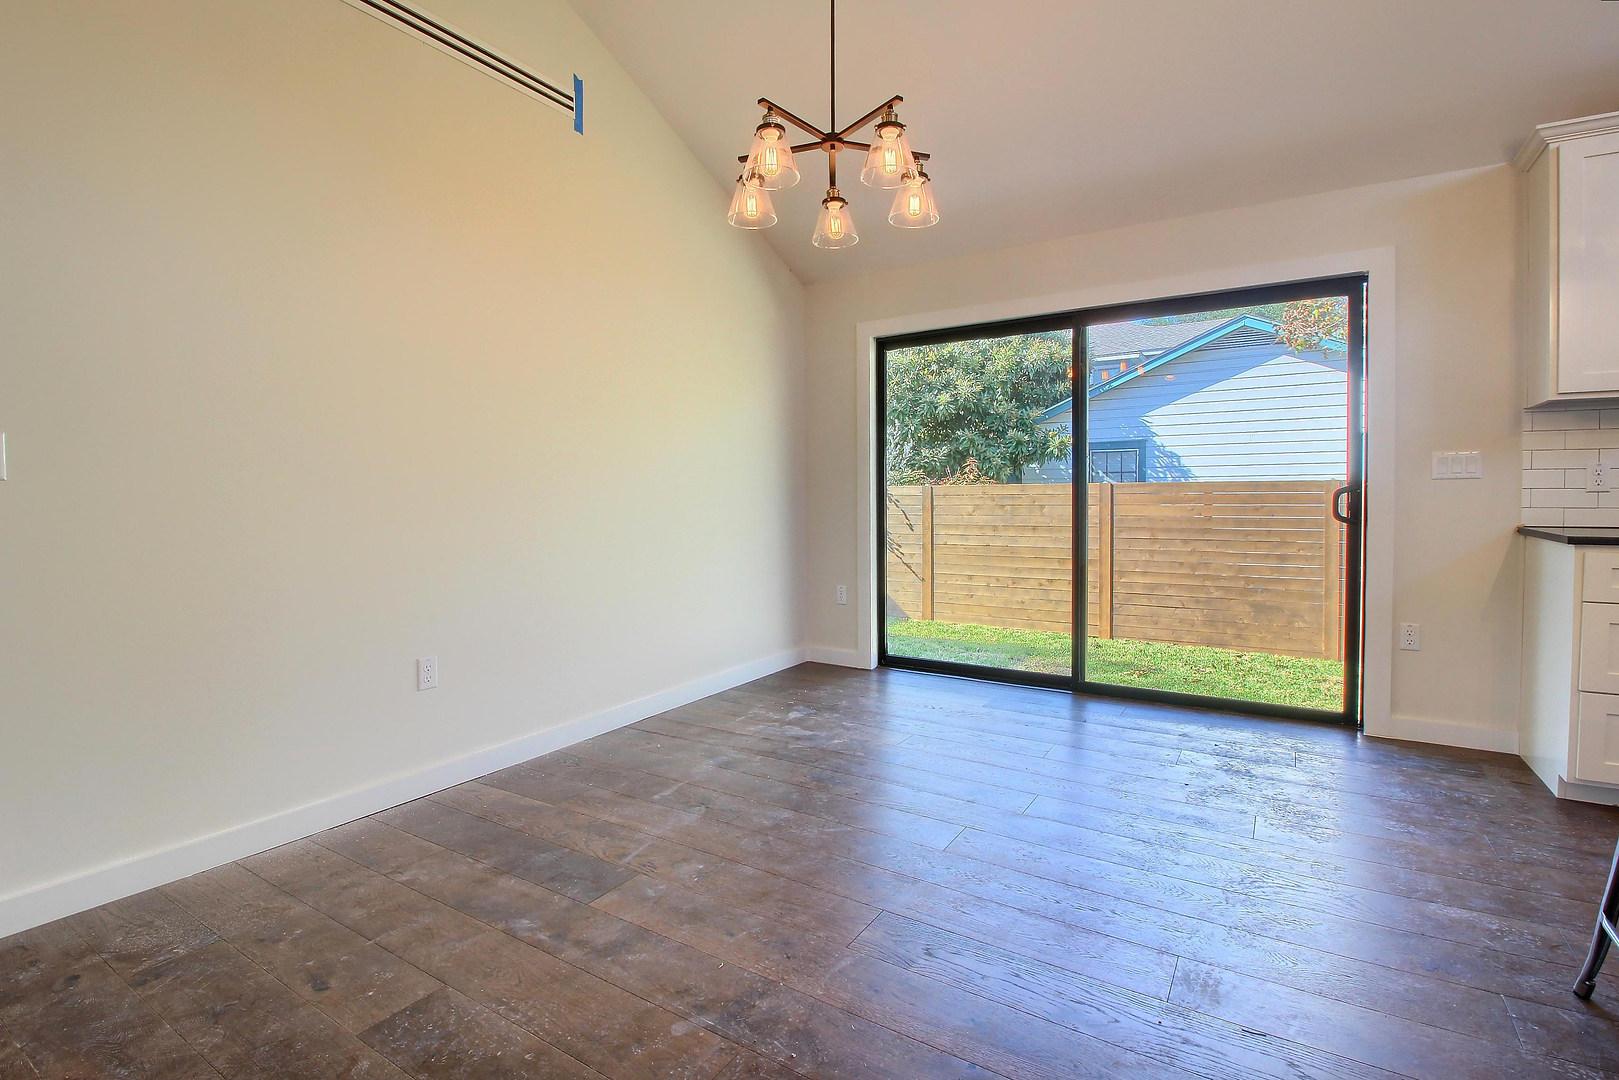 Home Renovation Light Fixtures on Bouldin in Austin, TX